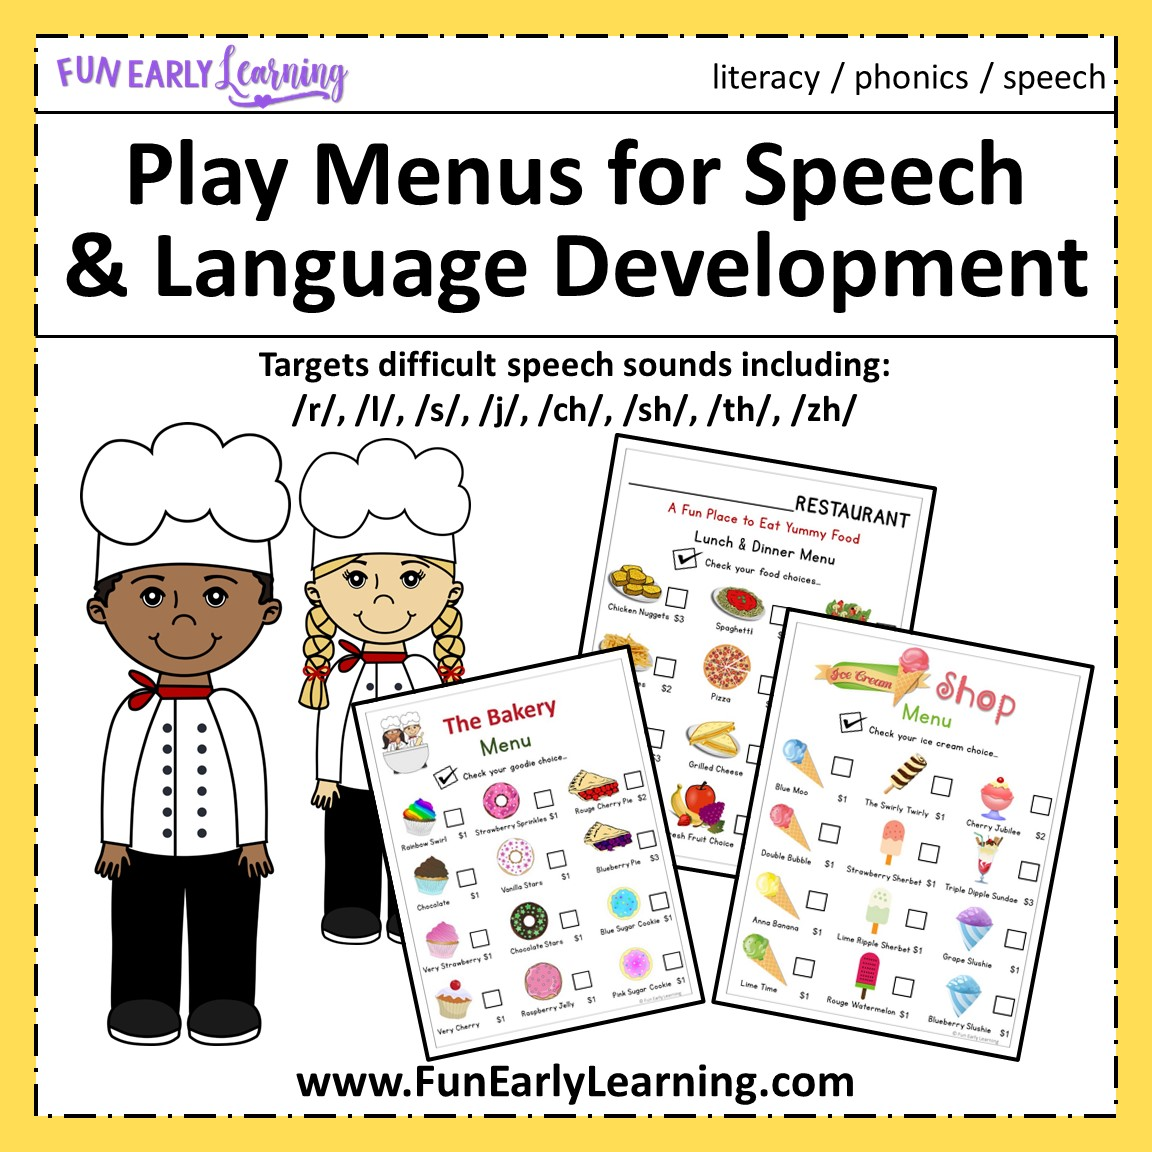 Play Menus For Speech And Language Development